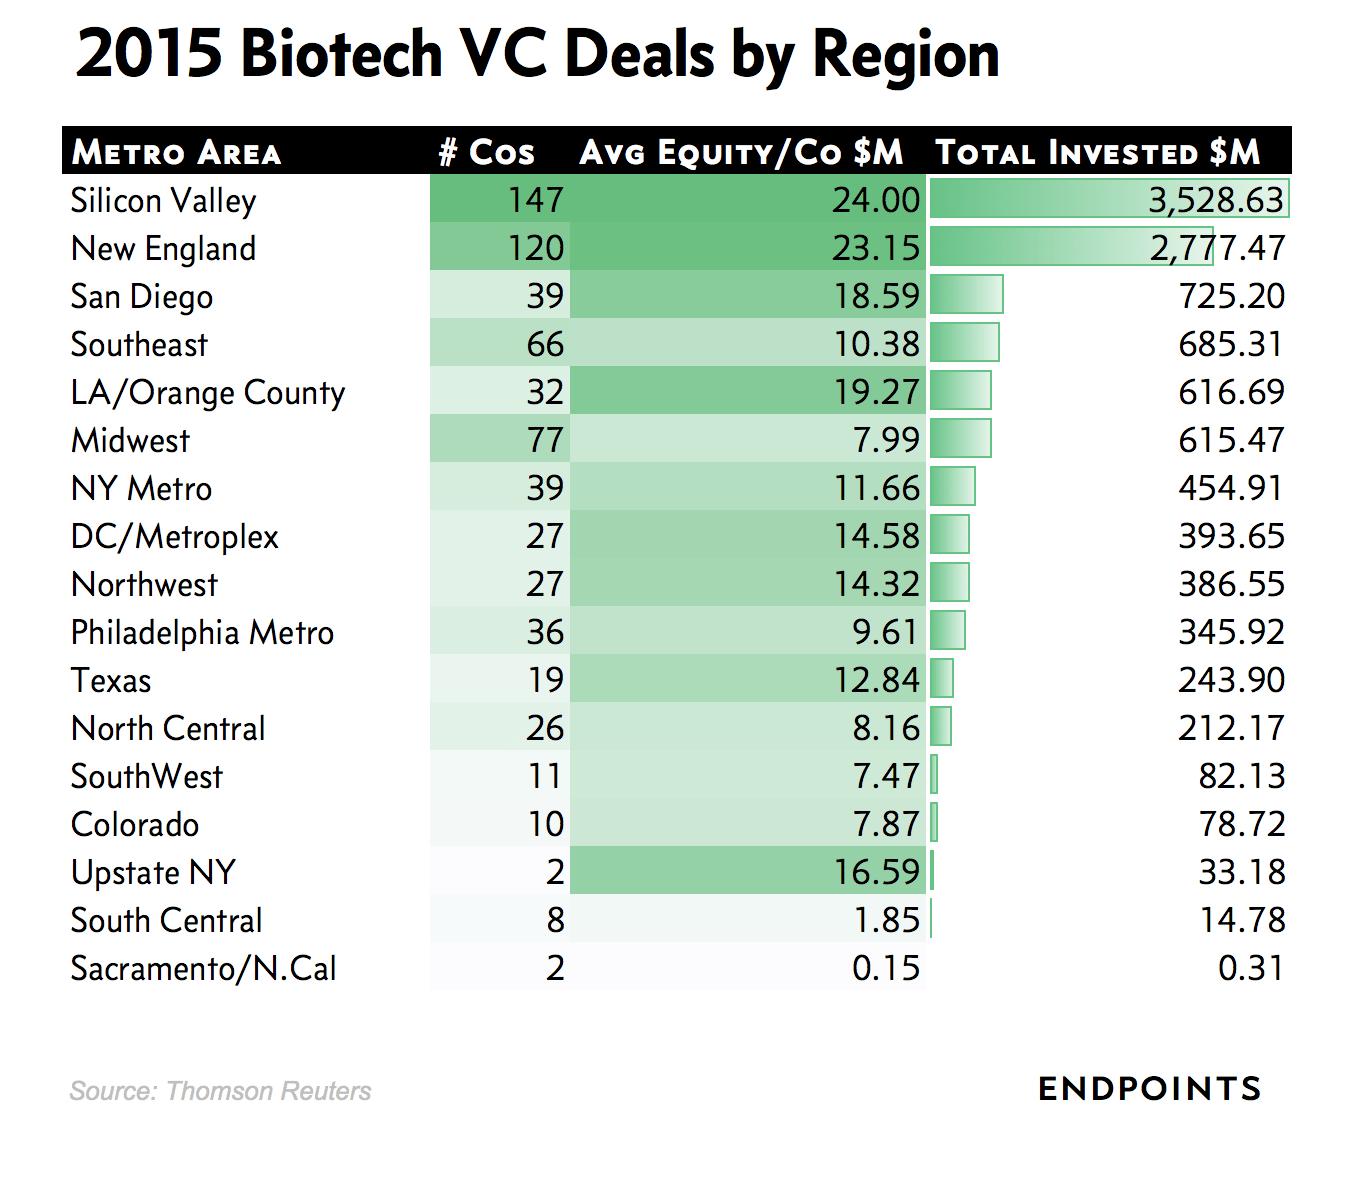 2015 Biotech VC Investing by Region